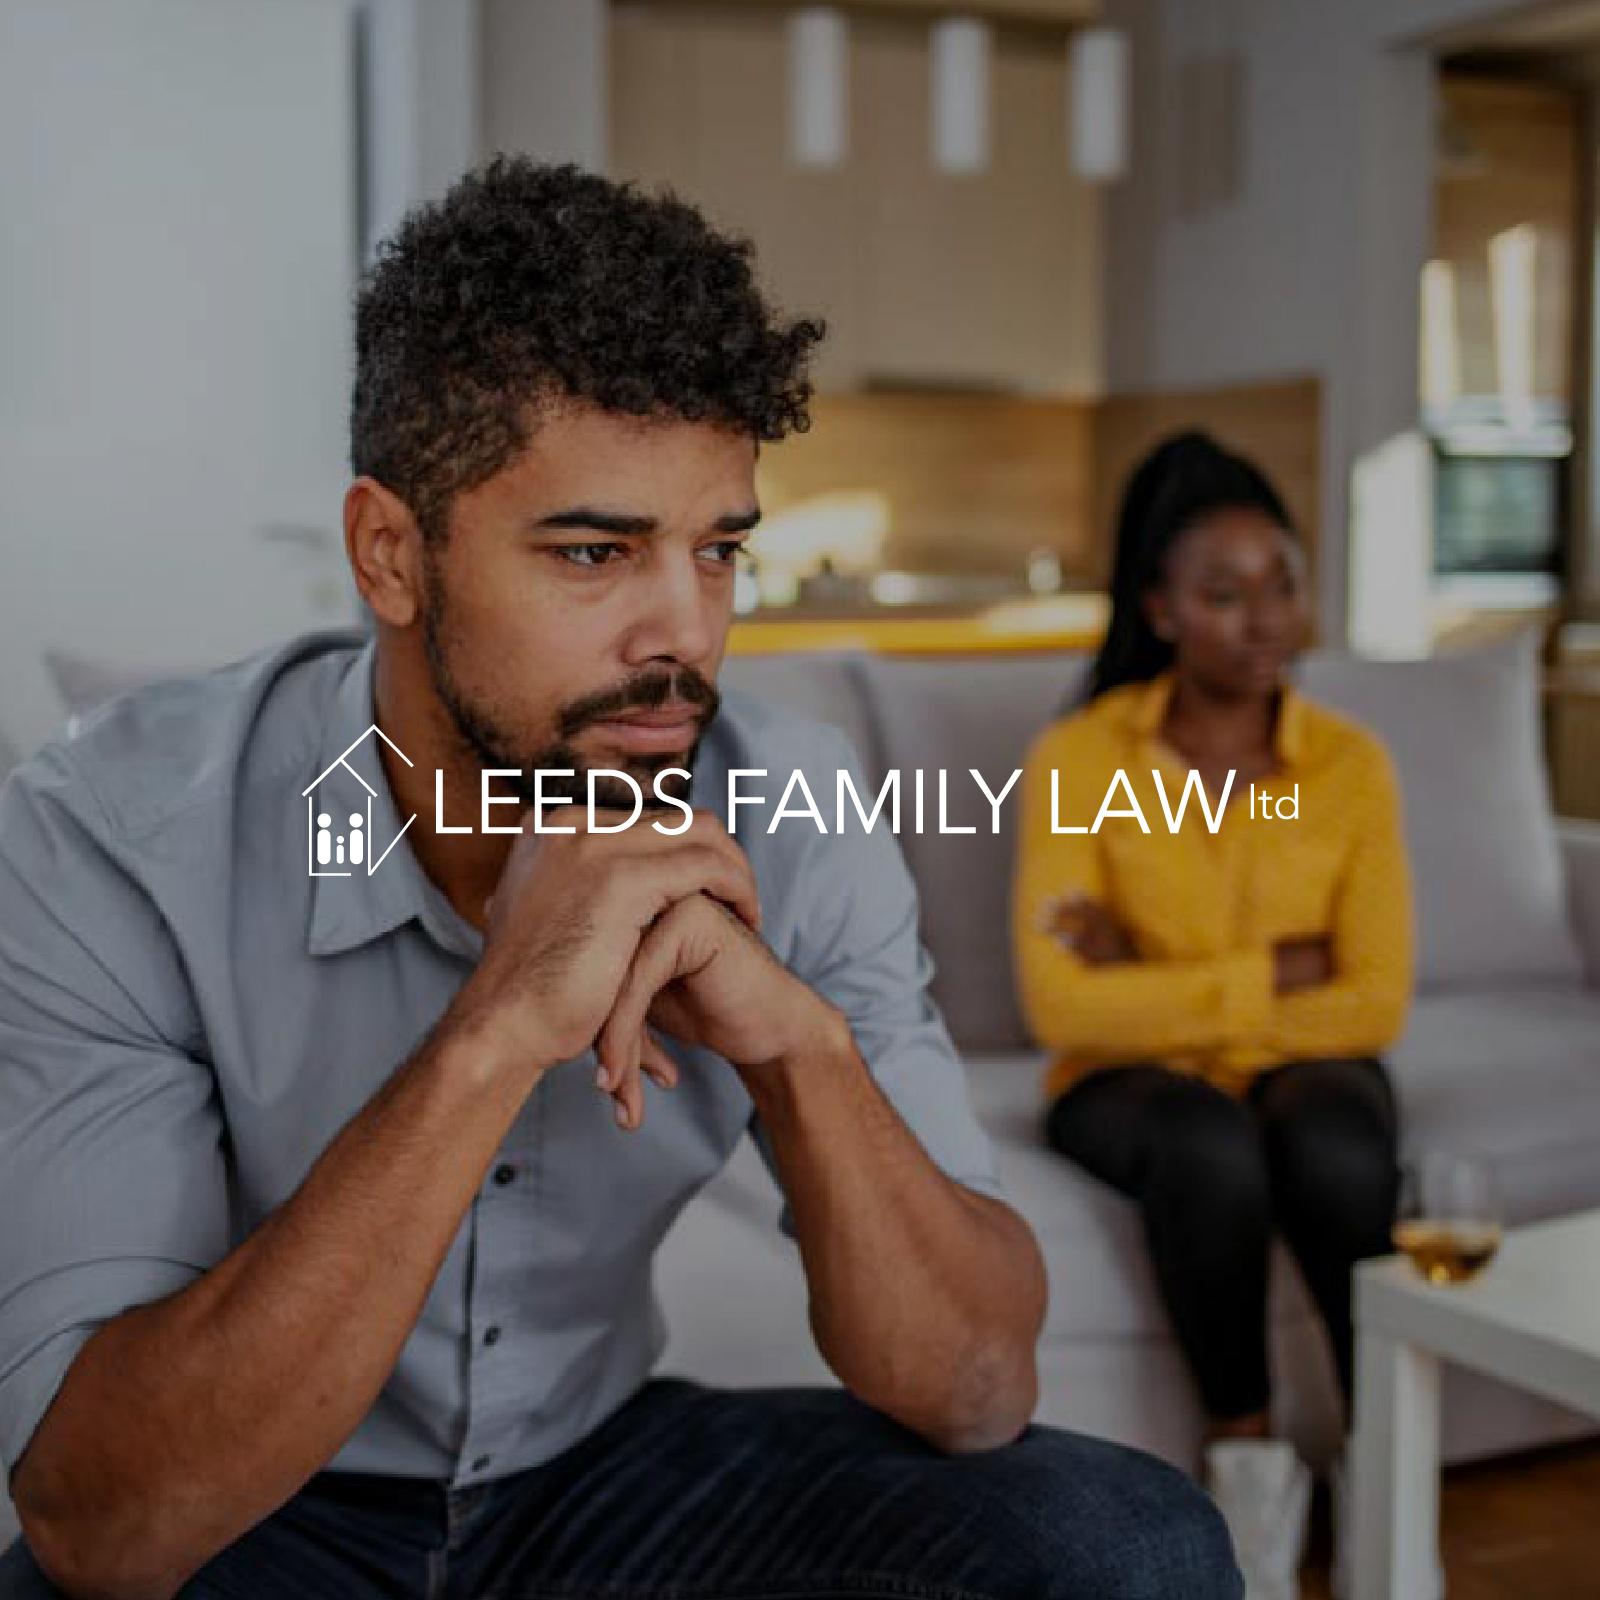 Leeds Family Law